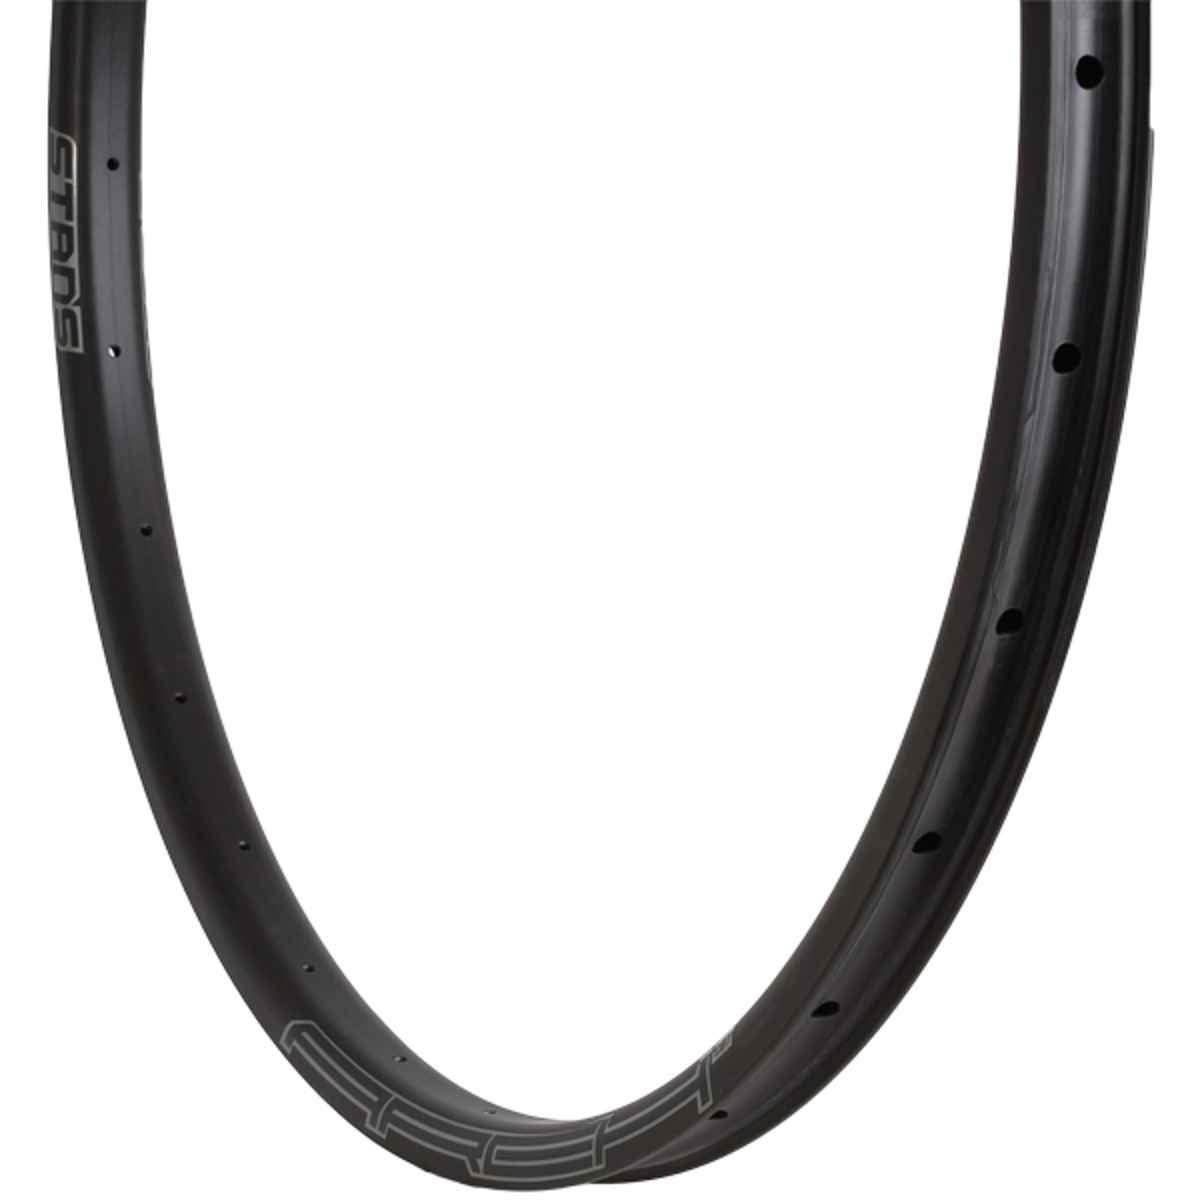 Stans' Arch Cb7 カーボン 29インチ ディスクリム ブラック 28H RTAC90001 B07KMJMBKV